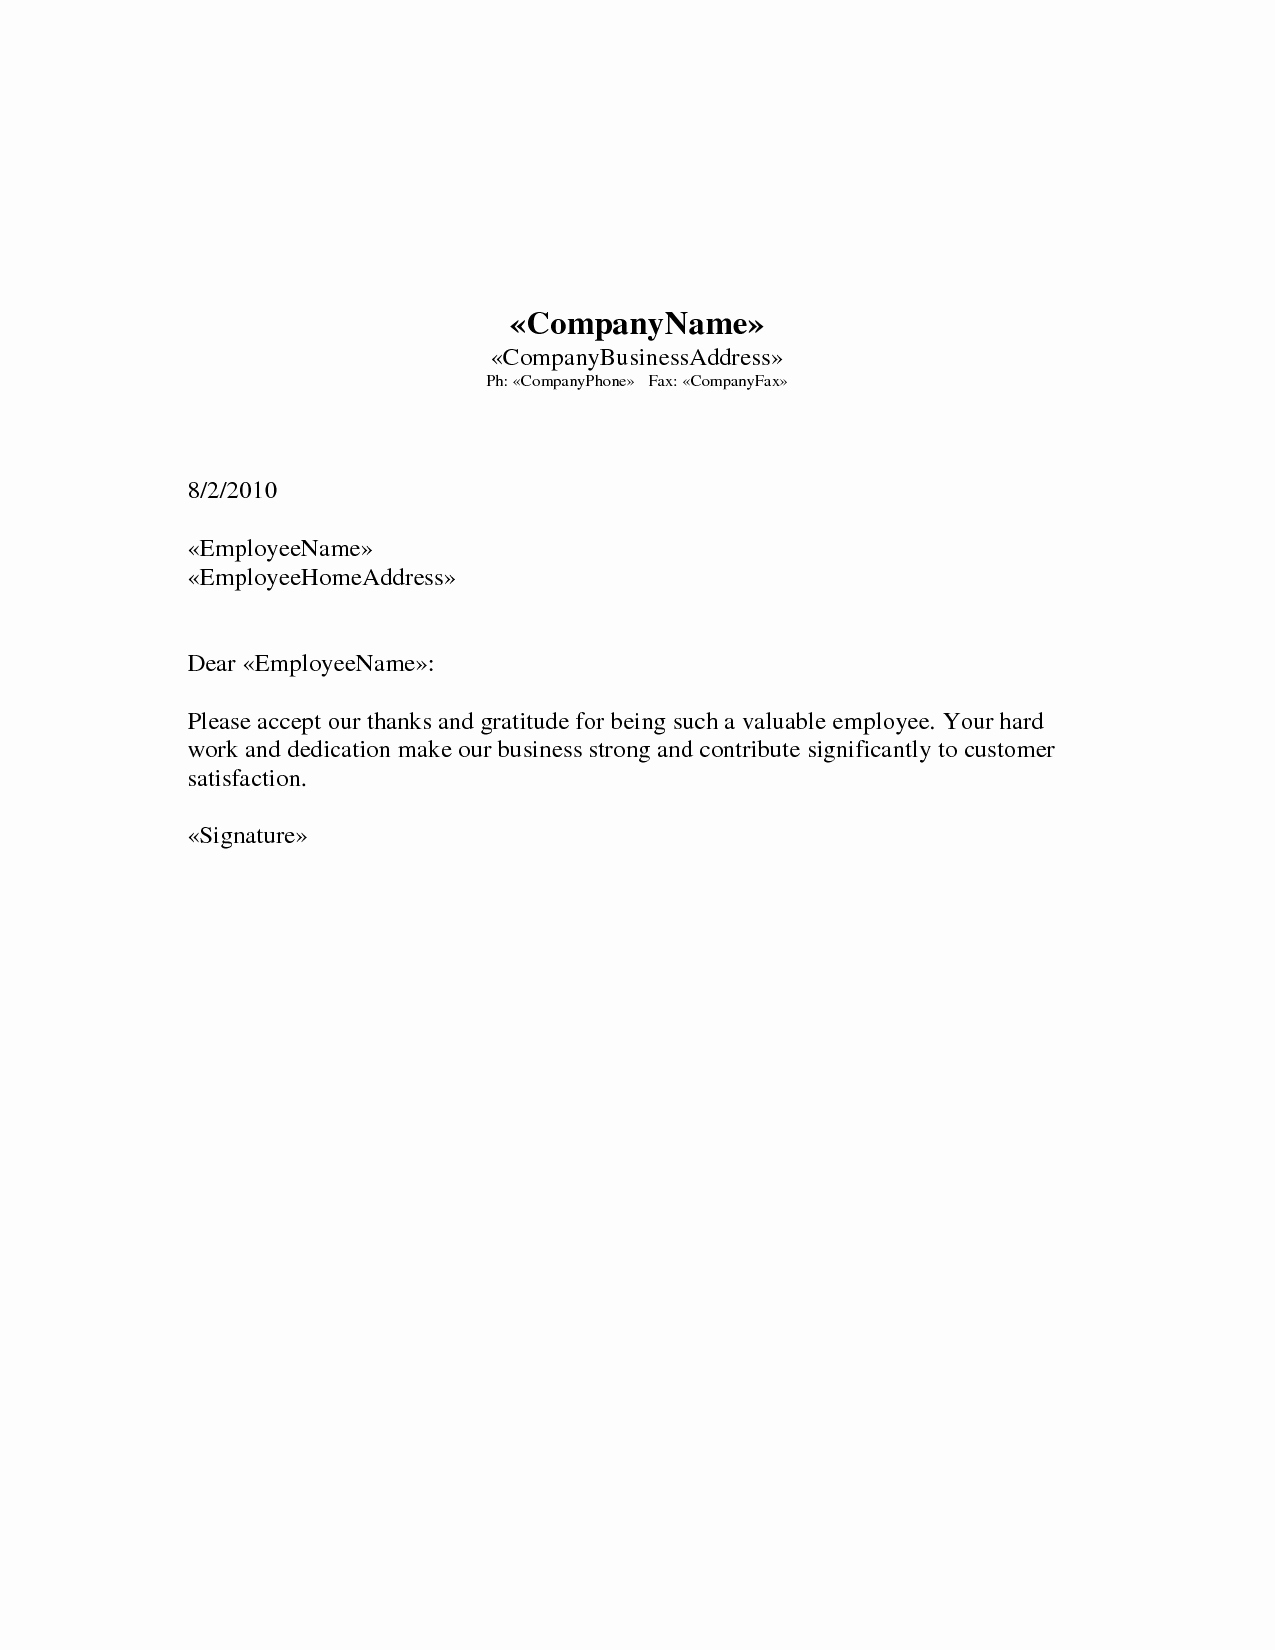 Retirement Letter Of Appreciation Inspirational Appreciation Letter